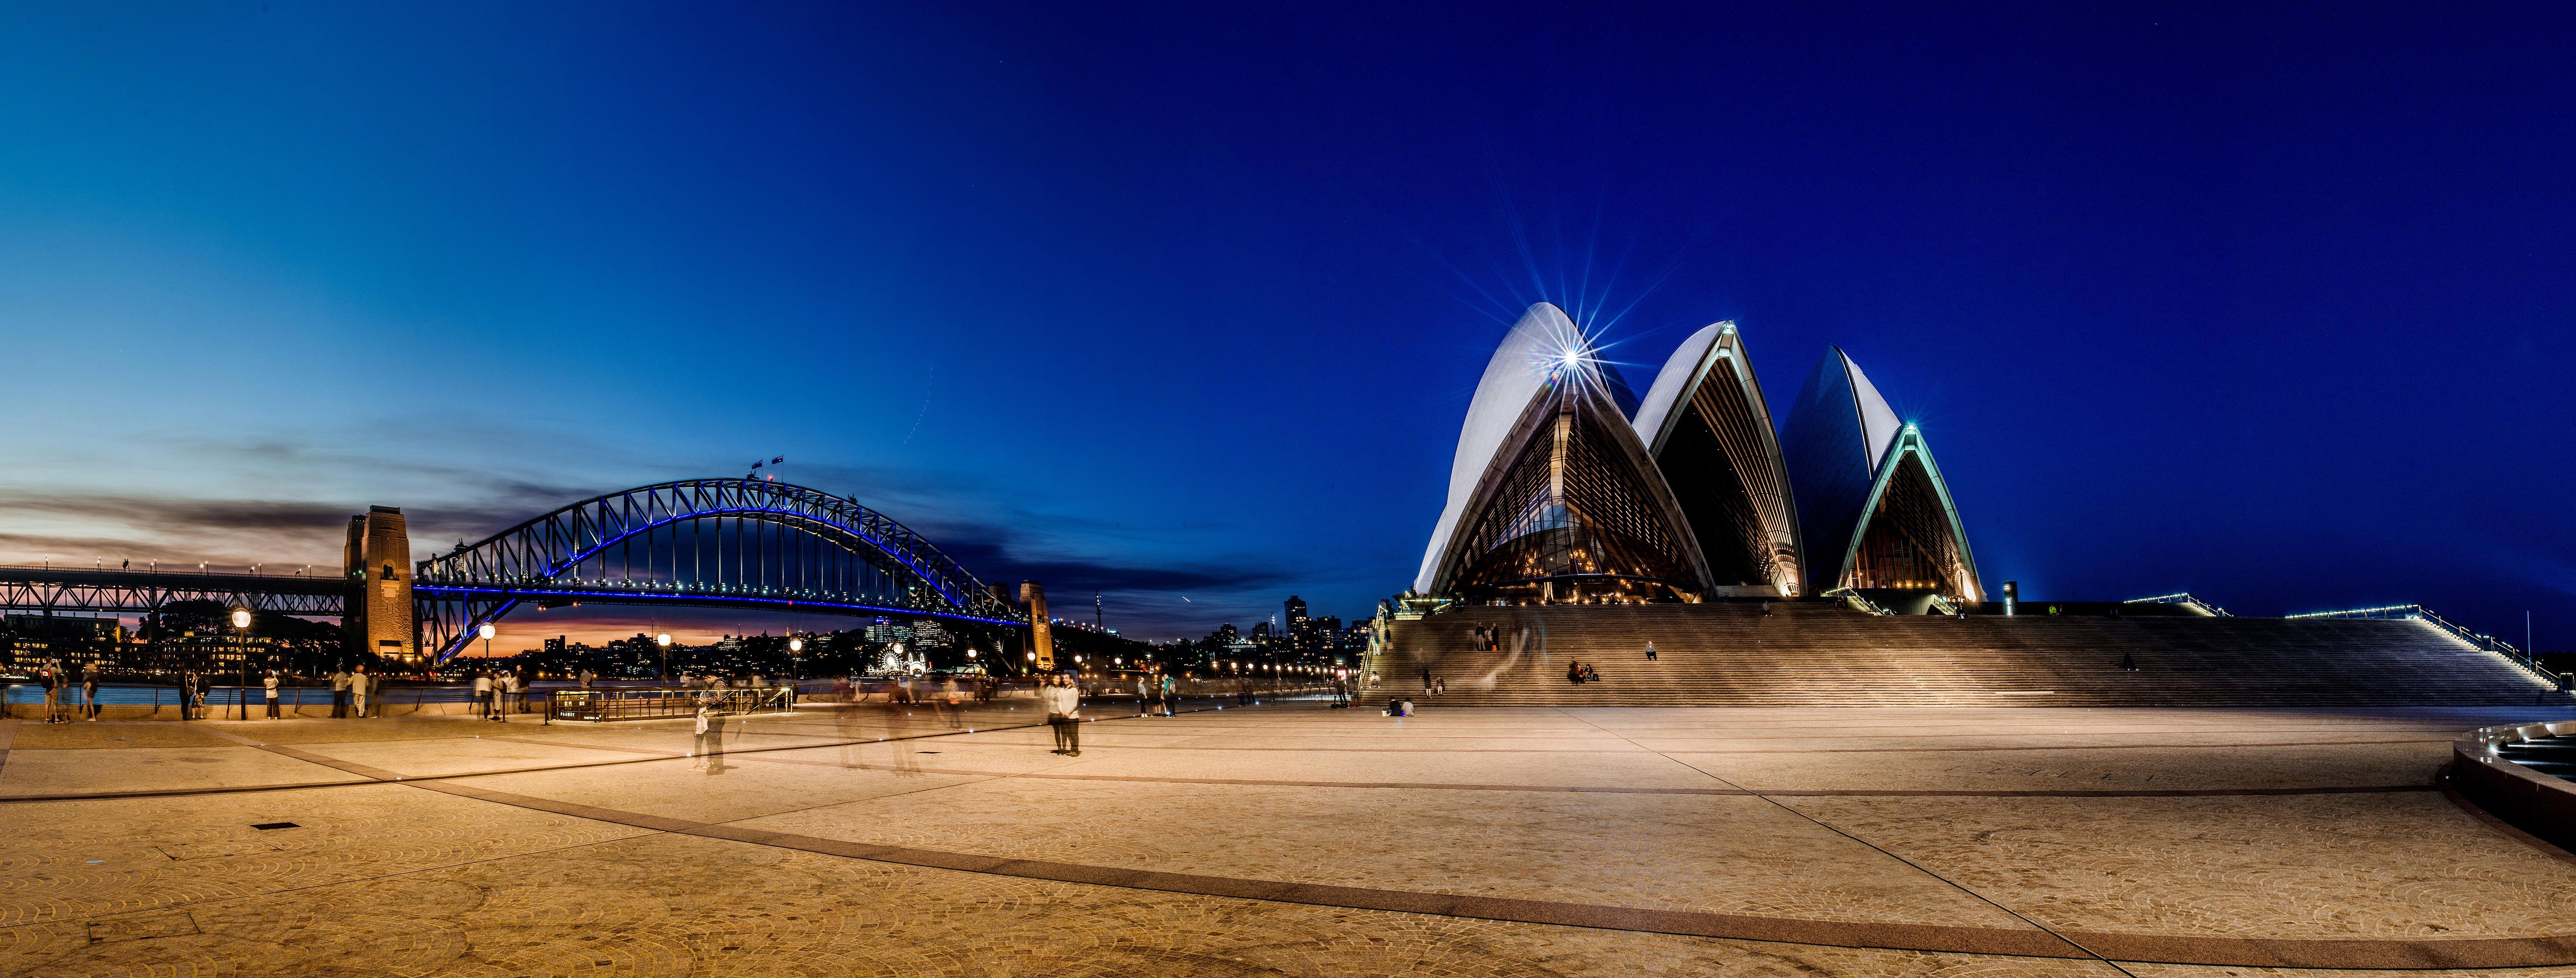 Paesaggi-Australia - DSC 7933  - Sydney-Opera-House_Australia - Sydney-Opera-House_Australia